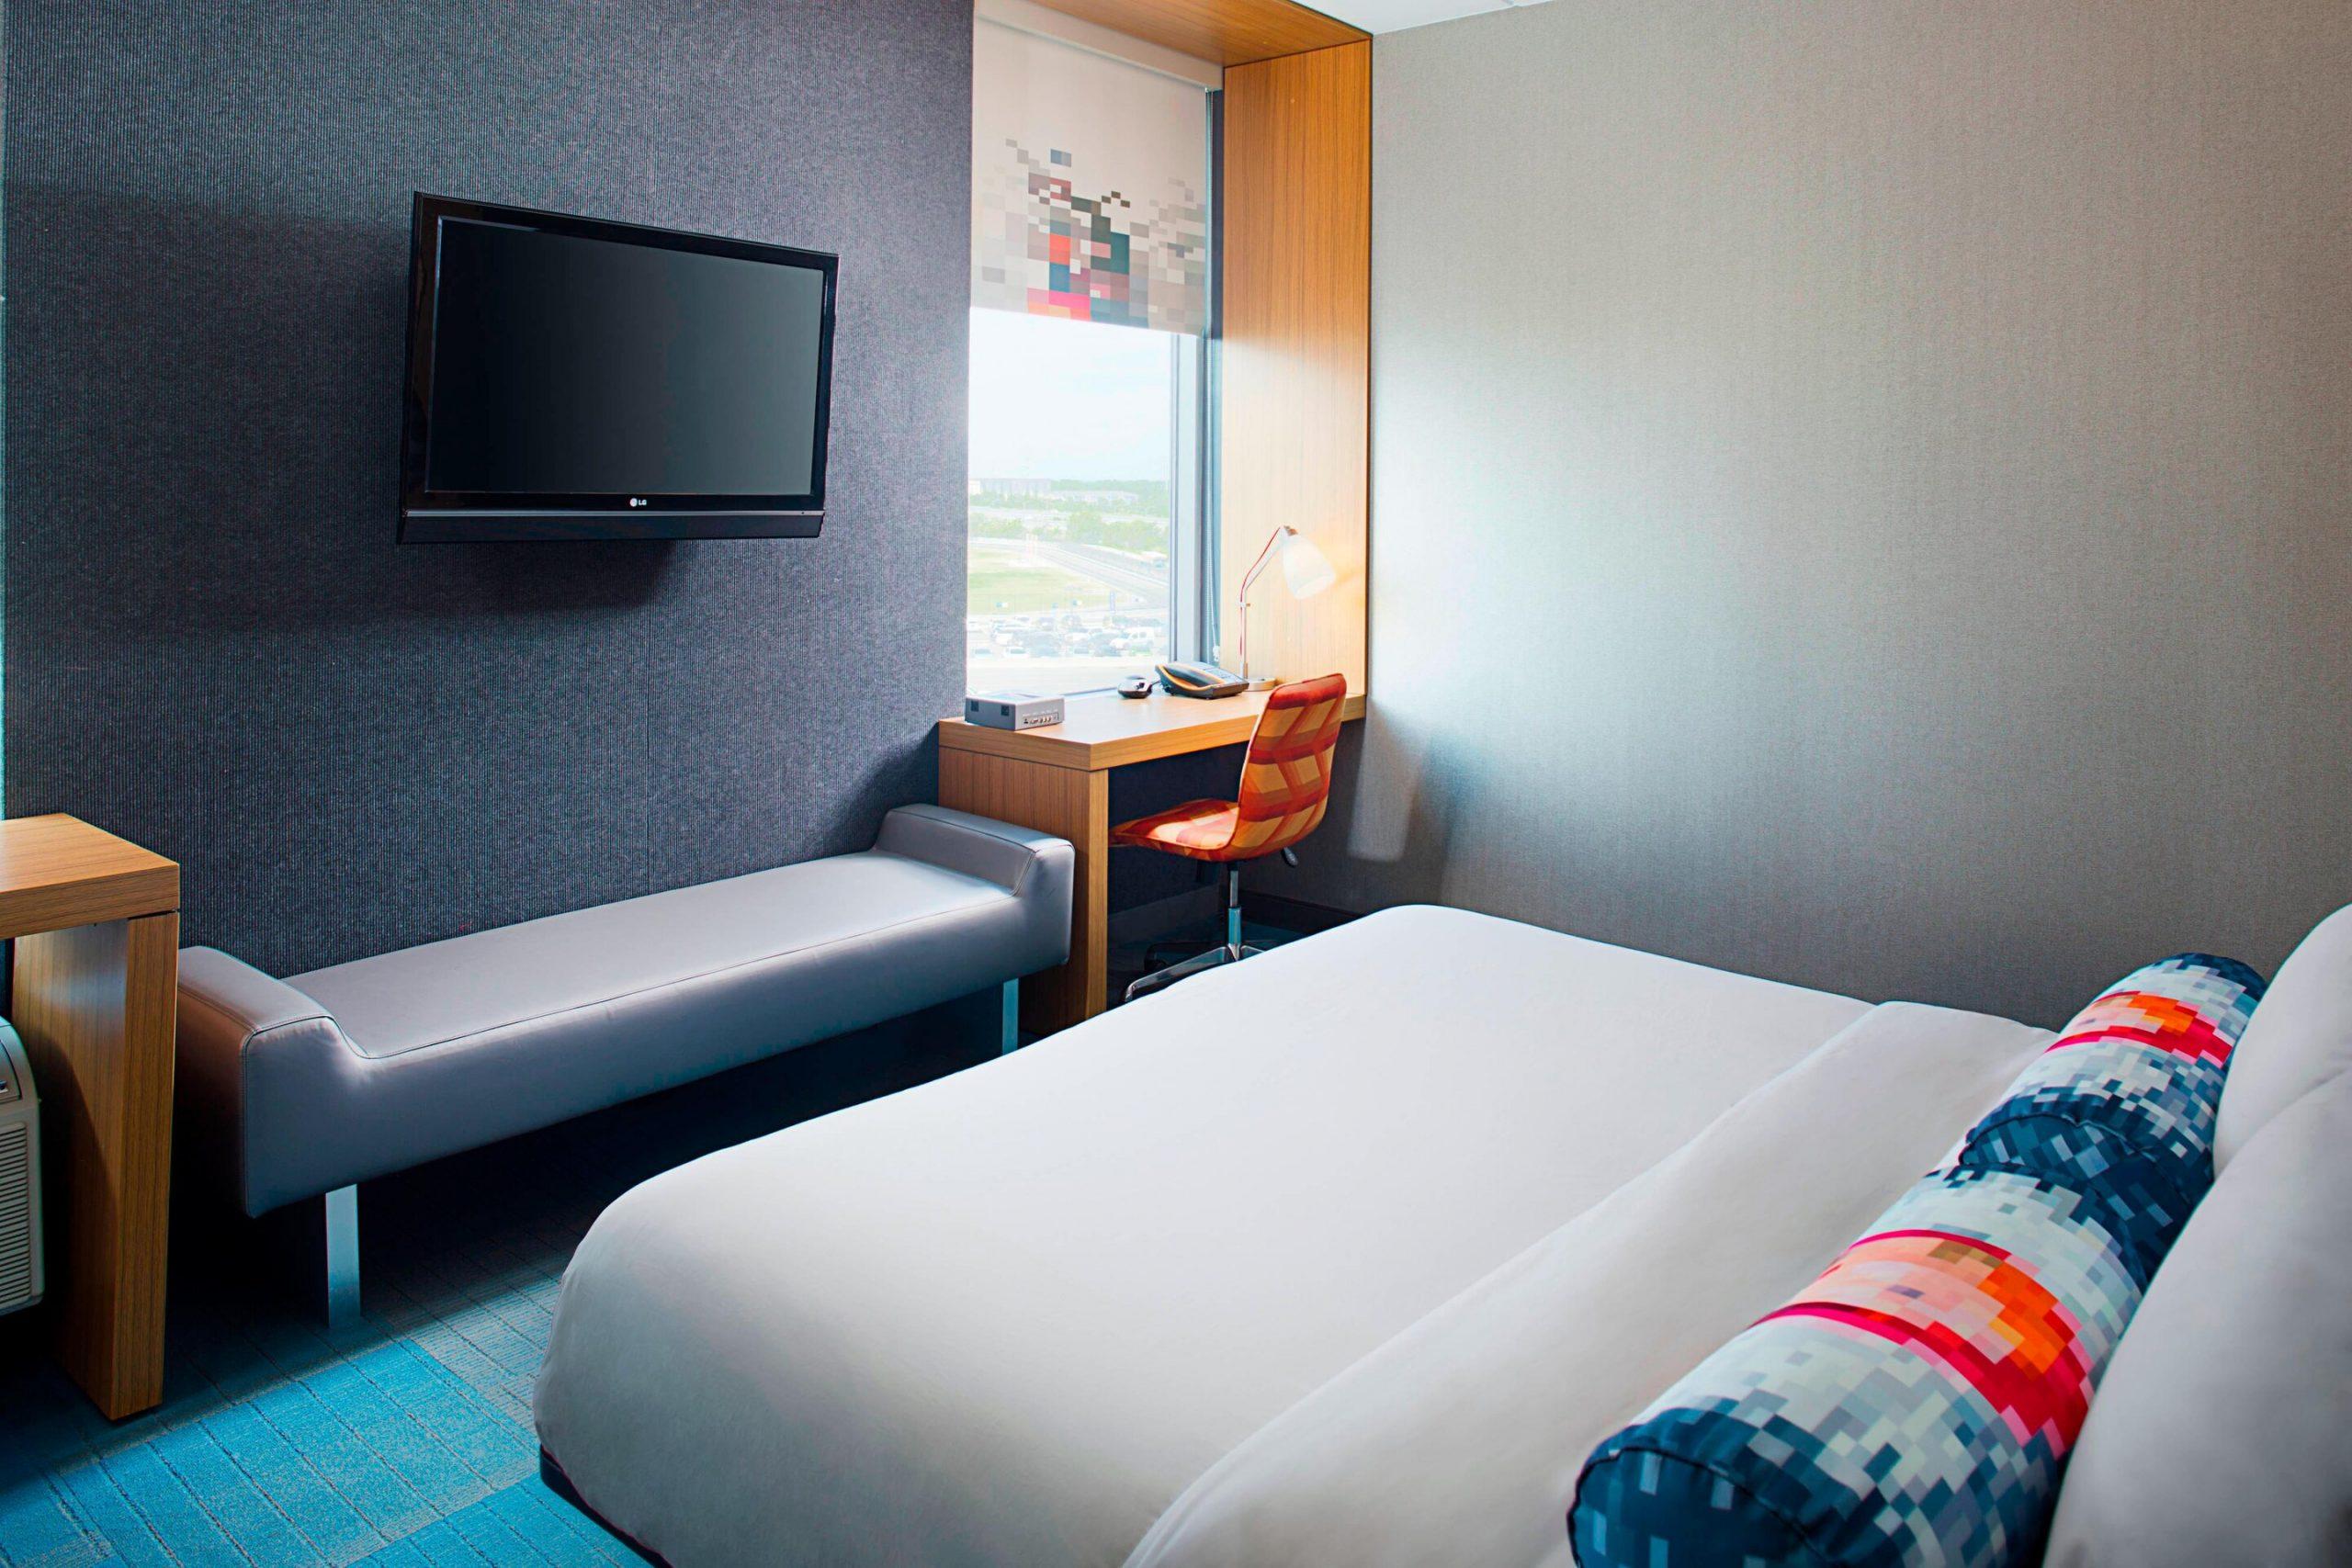 Aloft Philadelphia Airport_King Guest Room